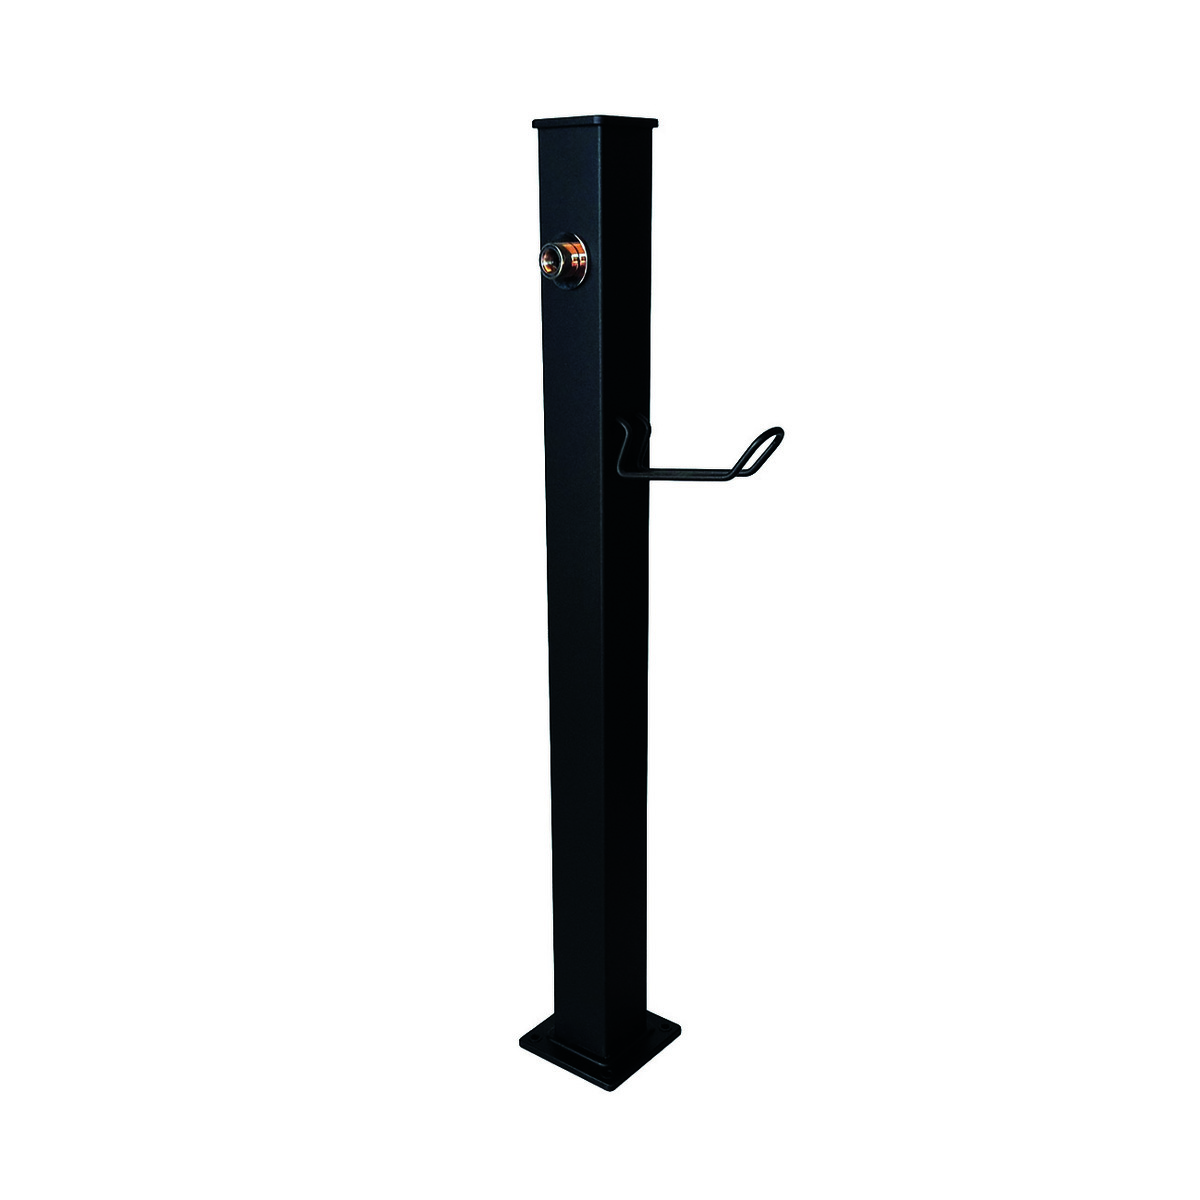 Portabottiglie acqua acciaio al miglior prezzo casa for Portabottiglie leroy merlin